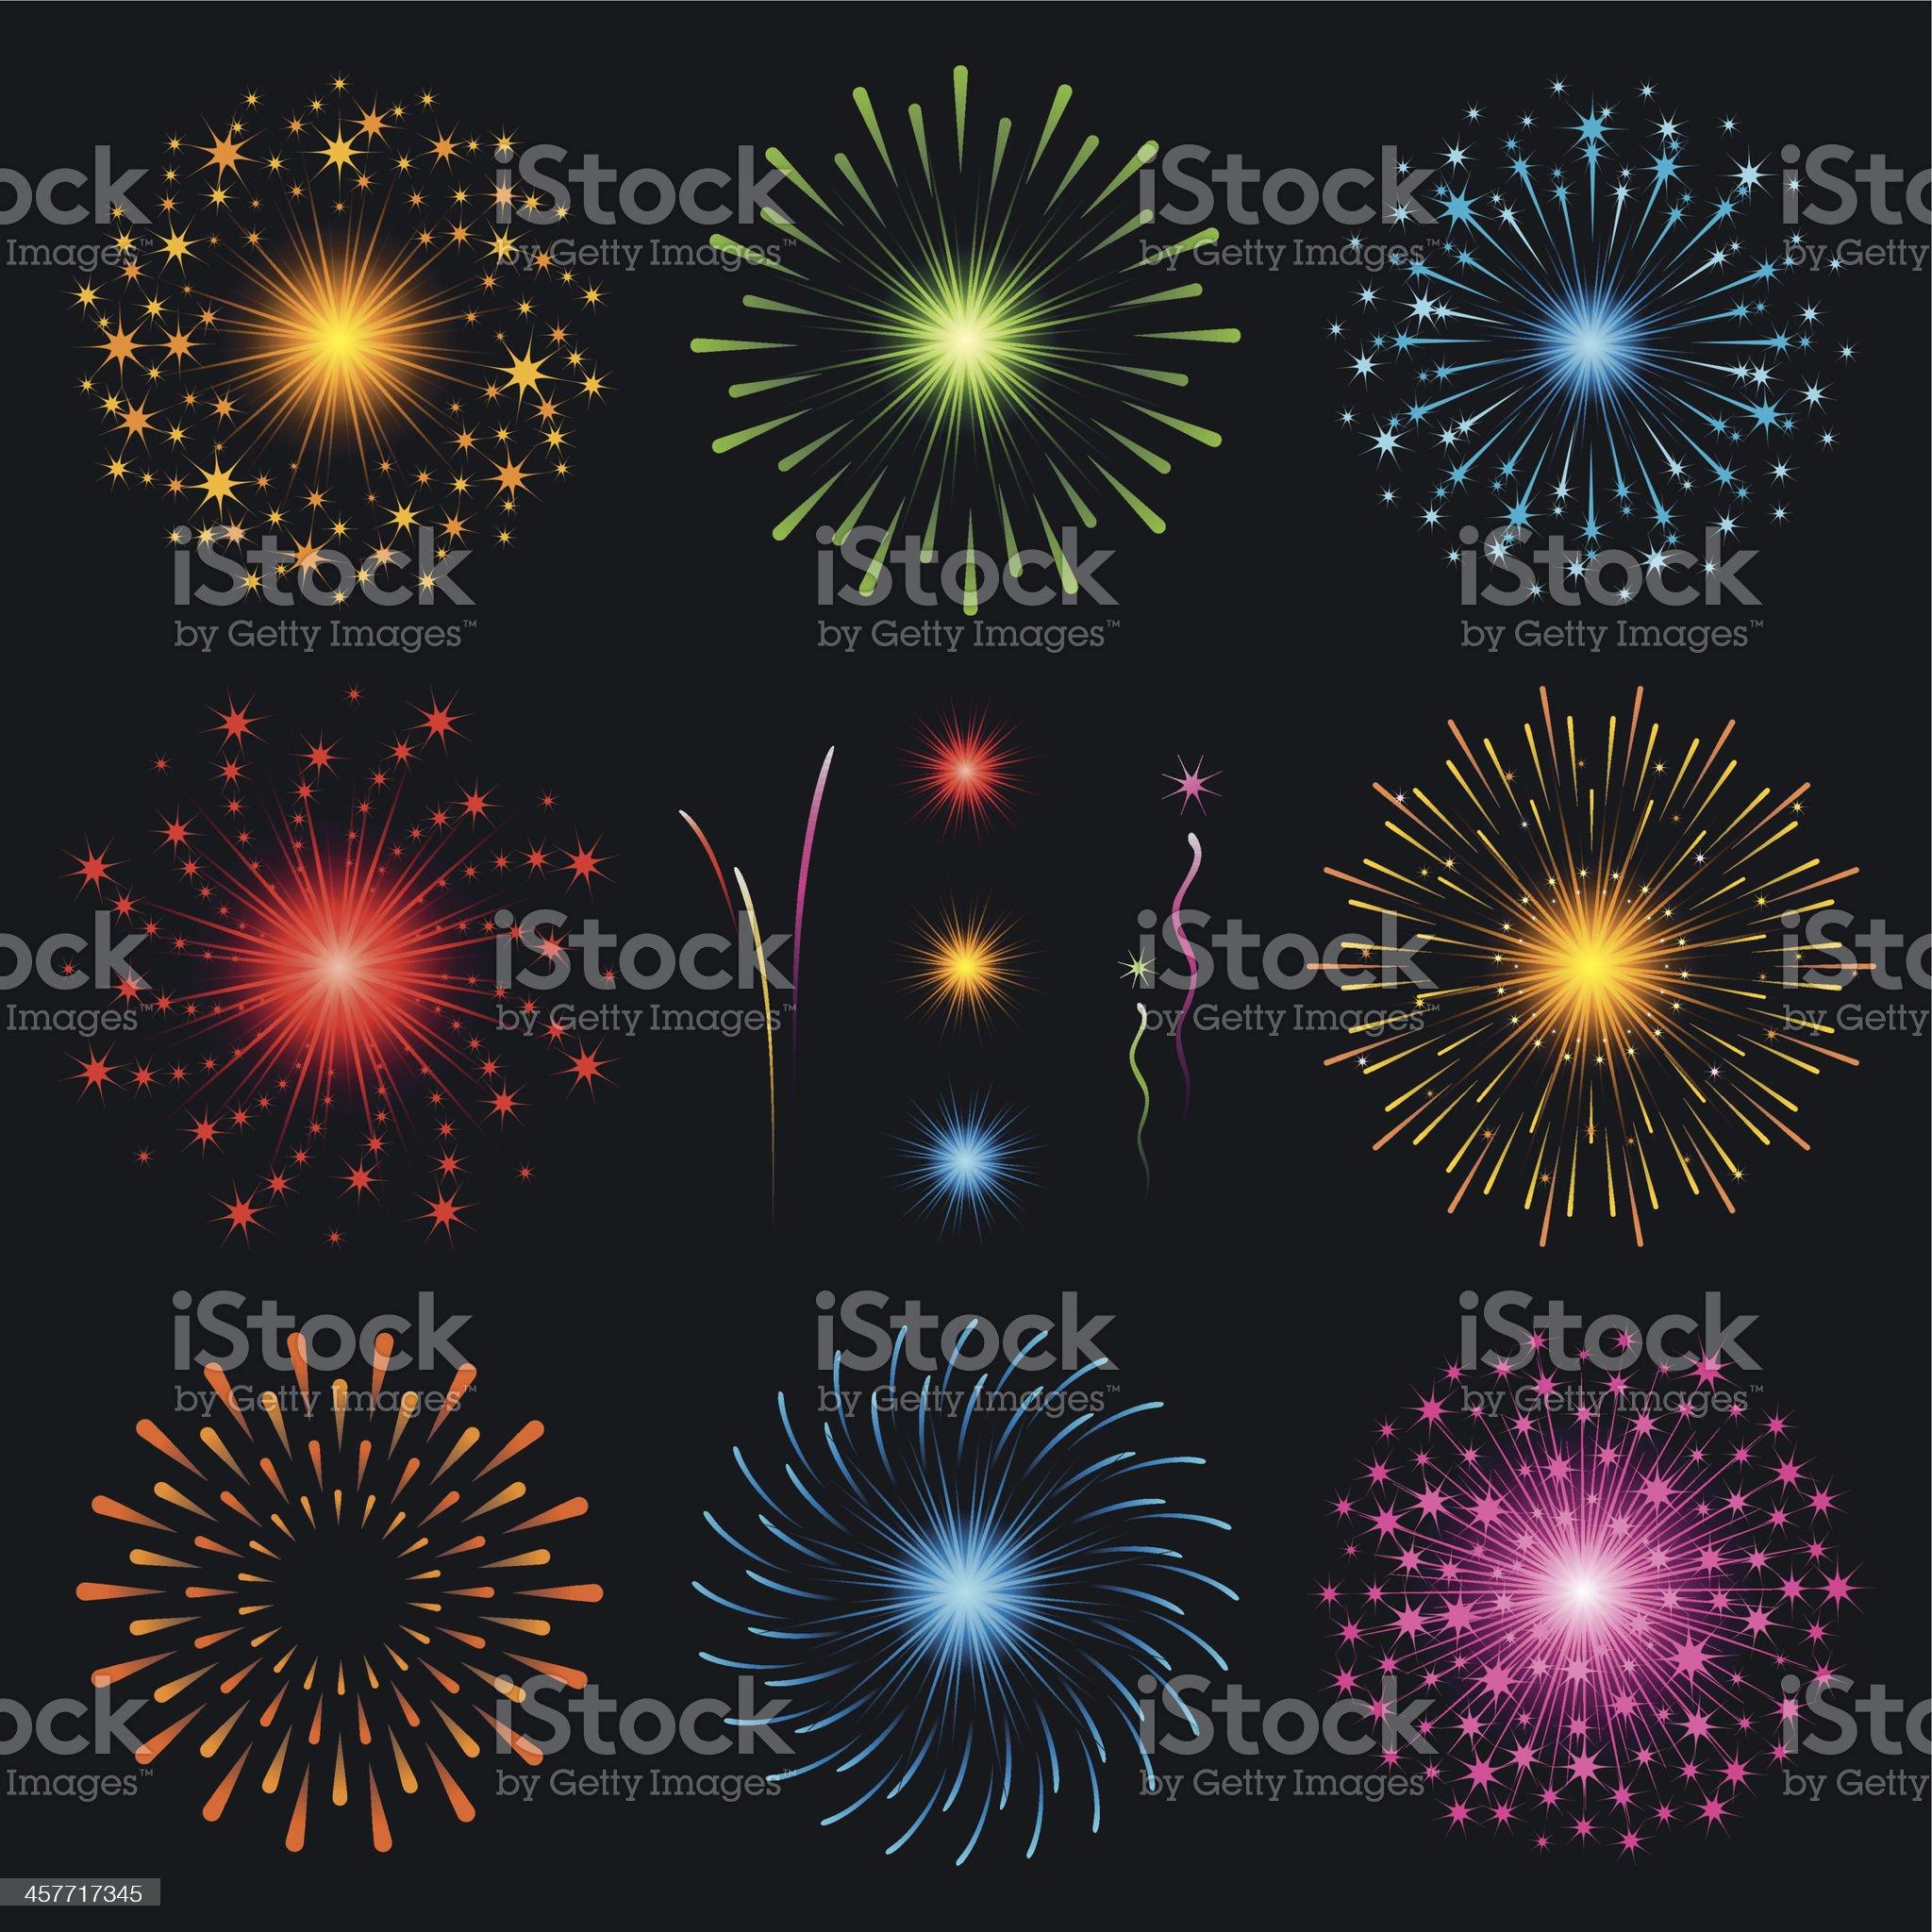 Fireworks - set royalty-free stock vector art